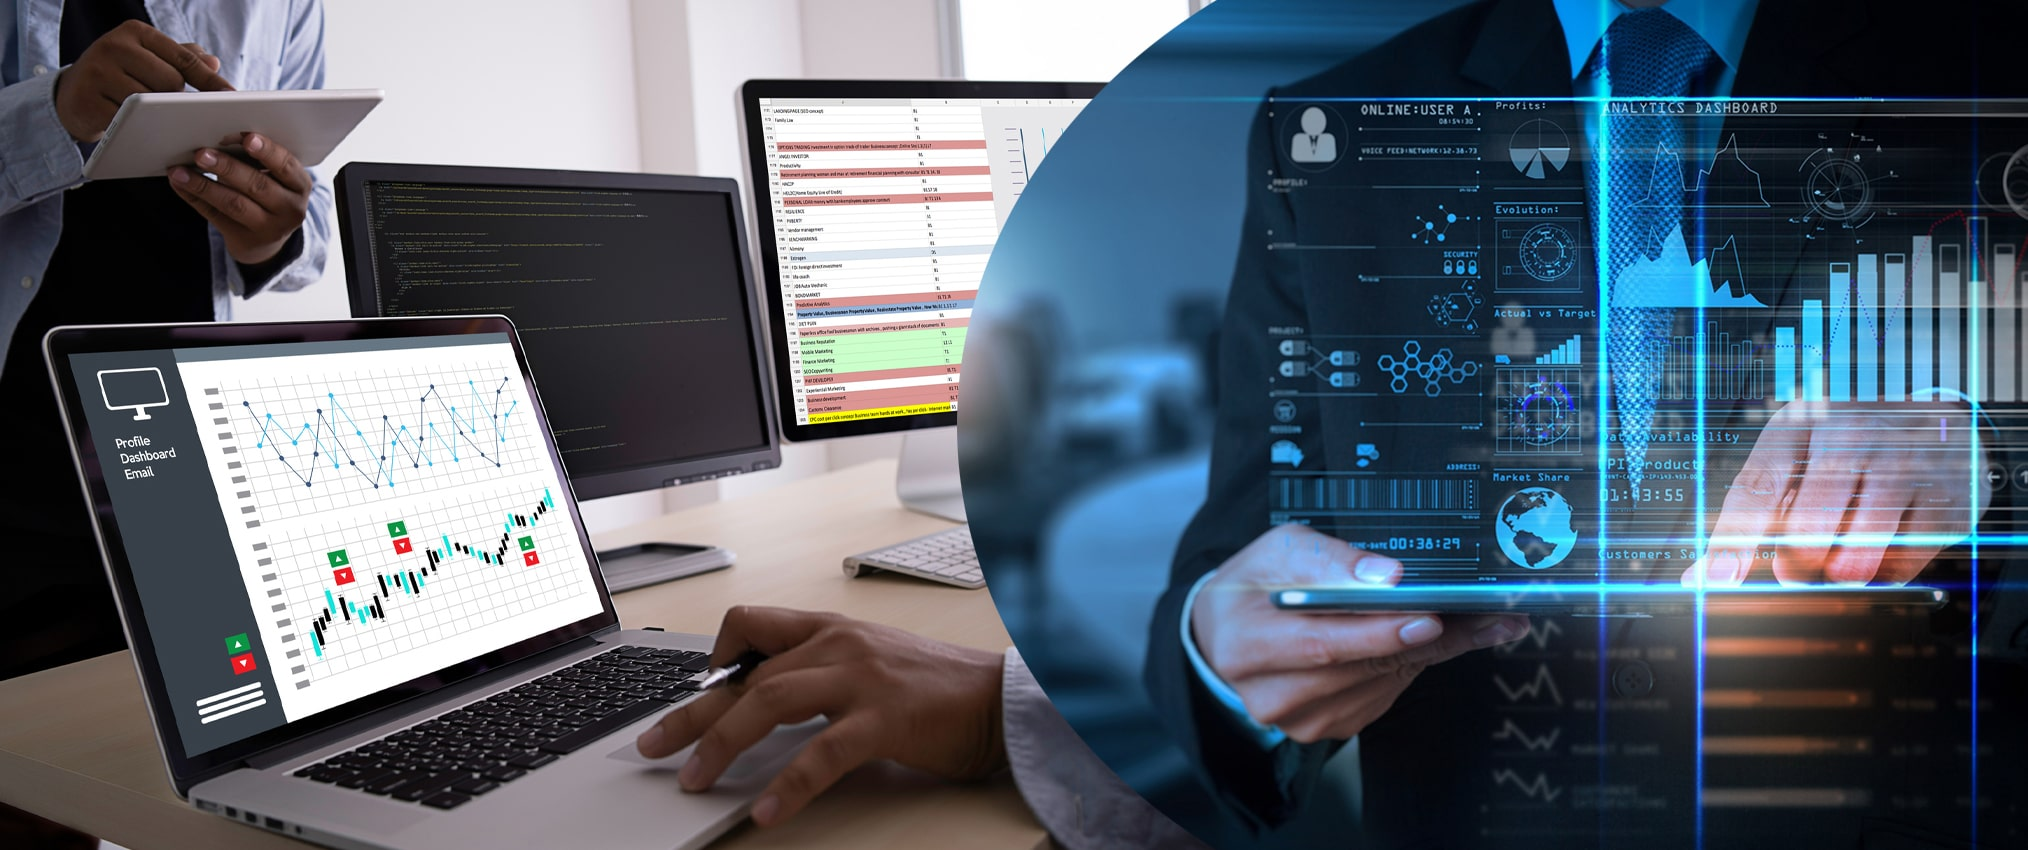 online survey processing data analytics